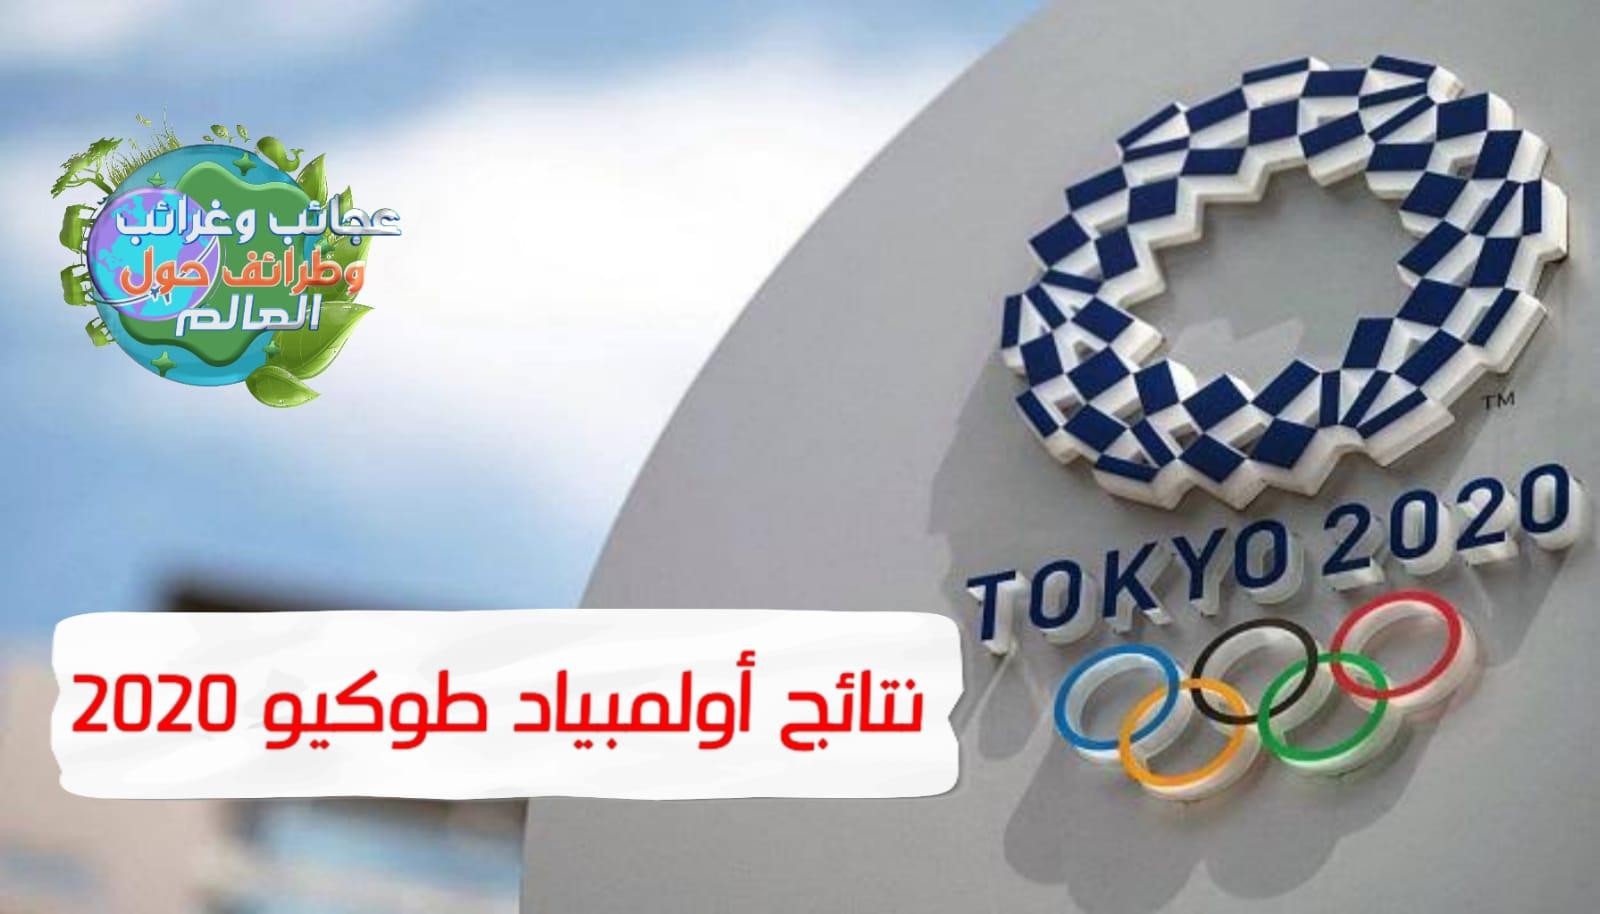 olympic games tokyo 2020,olympic games 2020,olympics,olympics 2021,tokyo 2020,olympics 2021 japan,eurosport olympics,tokyo olympics,olympic games 2021,olympic games 2021 japan,olympic games highlights 2021,tokyo olympics 2020,tokyo olympics 2021,olympic games highlights,olympic games,tokyo,olympics 2020,2020 tokyo olympics,tokyo 2020 venues,tokyo olympics 2020 india,boxing olympic games tokyo 2020,olympic swimming,summer olympics,2020 olympics,tokyo 2020,olympic games tokyo 2020,olympic games 2020,tokyo olympics 2020,tokyo olympics,tokyo,tokyo 2020 venues,tokio 2020,tokyo olympics 2021,olimpiade tokyo 2020,tokyo 2020 olympic games,boxing olympic games tokyo 2020,2020 tokyo olympics opening ceremony,tokyo olympics opening ceremony 2020,2021 tokyo olympics,tokyo live,tokyo games,tokyo japan,olympics 2020,sindhu tokyo,tokyo olympics opening ceremony,mens 100m tokyo,tokyo today day 8 ,طوكيو,اولمبياد طوكيو 2021,طوكيو 2021,olympics 2021,olympic games 2021,olympics 2021 japan,olympic games 2021 japan,olympic games highlights 2021,الألعاب الأولمبية بطوكيو 2021,اولمبياد طوكيو 2021 لكرة القدم رجال,جدول المباريات اولمبياد طوكيو 2021,مواعيد مباريات اولمبياد طوكيو 2021,نتائج مباريات اليوم اولمبياد طوكيو 2021,مصر طوكيو 2021,مباراة البرازيل والمكسيك اولمبياد طوكيو 2021,أولمبياد طوكيو 2021,اولمبياد طوكيو 2020,أولمبياد طوكيو 2021 مباشر,طوكيو 2020,اولمبياد طوكيو 2021,طوكيو,اولمبياد طوكيو 2021 لكرة القدم رجال,جدول المباريات اولمبياد طوكيو 2021,مواعيد مباريات اولمبياد طوكيو 2021,نتائج مباريات اليوم اولمبياد طوكيو 2021,الألعاب الأولمبية بطوكيو 2021,أولمبياد طوكيو,طوكيو 2021,اولمبياد طوكيو,أولمبياد,اولمبياد طوكيو 2020 لكرة القدم رجال,الألعاب الأولمبية,أولمبياد طوكيو 2021,كرة اليد أولمبياد طوكيو 2021,أولمبياد طوكيو 2021 مباشر,مباريات اولمبياد طوكيو,اولمبياد طوكيو 2021 كرة القدم,اللجنة الأولمبية الدولية ,أولمبياد طوكيو,اولمبياد طوكيو,طوكيو,اولمبياد طوكيو 2021,اولمبياد طوكيو 2020,أولمبياد طوكيو 2020,أولمبياد طوكيو 2021,اولمبياد طوكيو ٢٠٢٠,مباريات اولمبياد طوكيو,أولمبياد,اولمبياد طوكيو 2020 